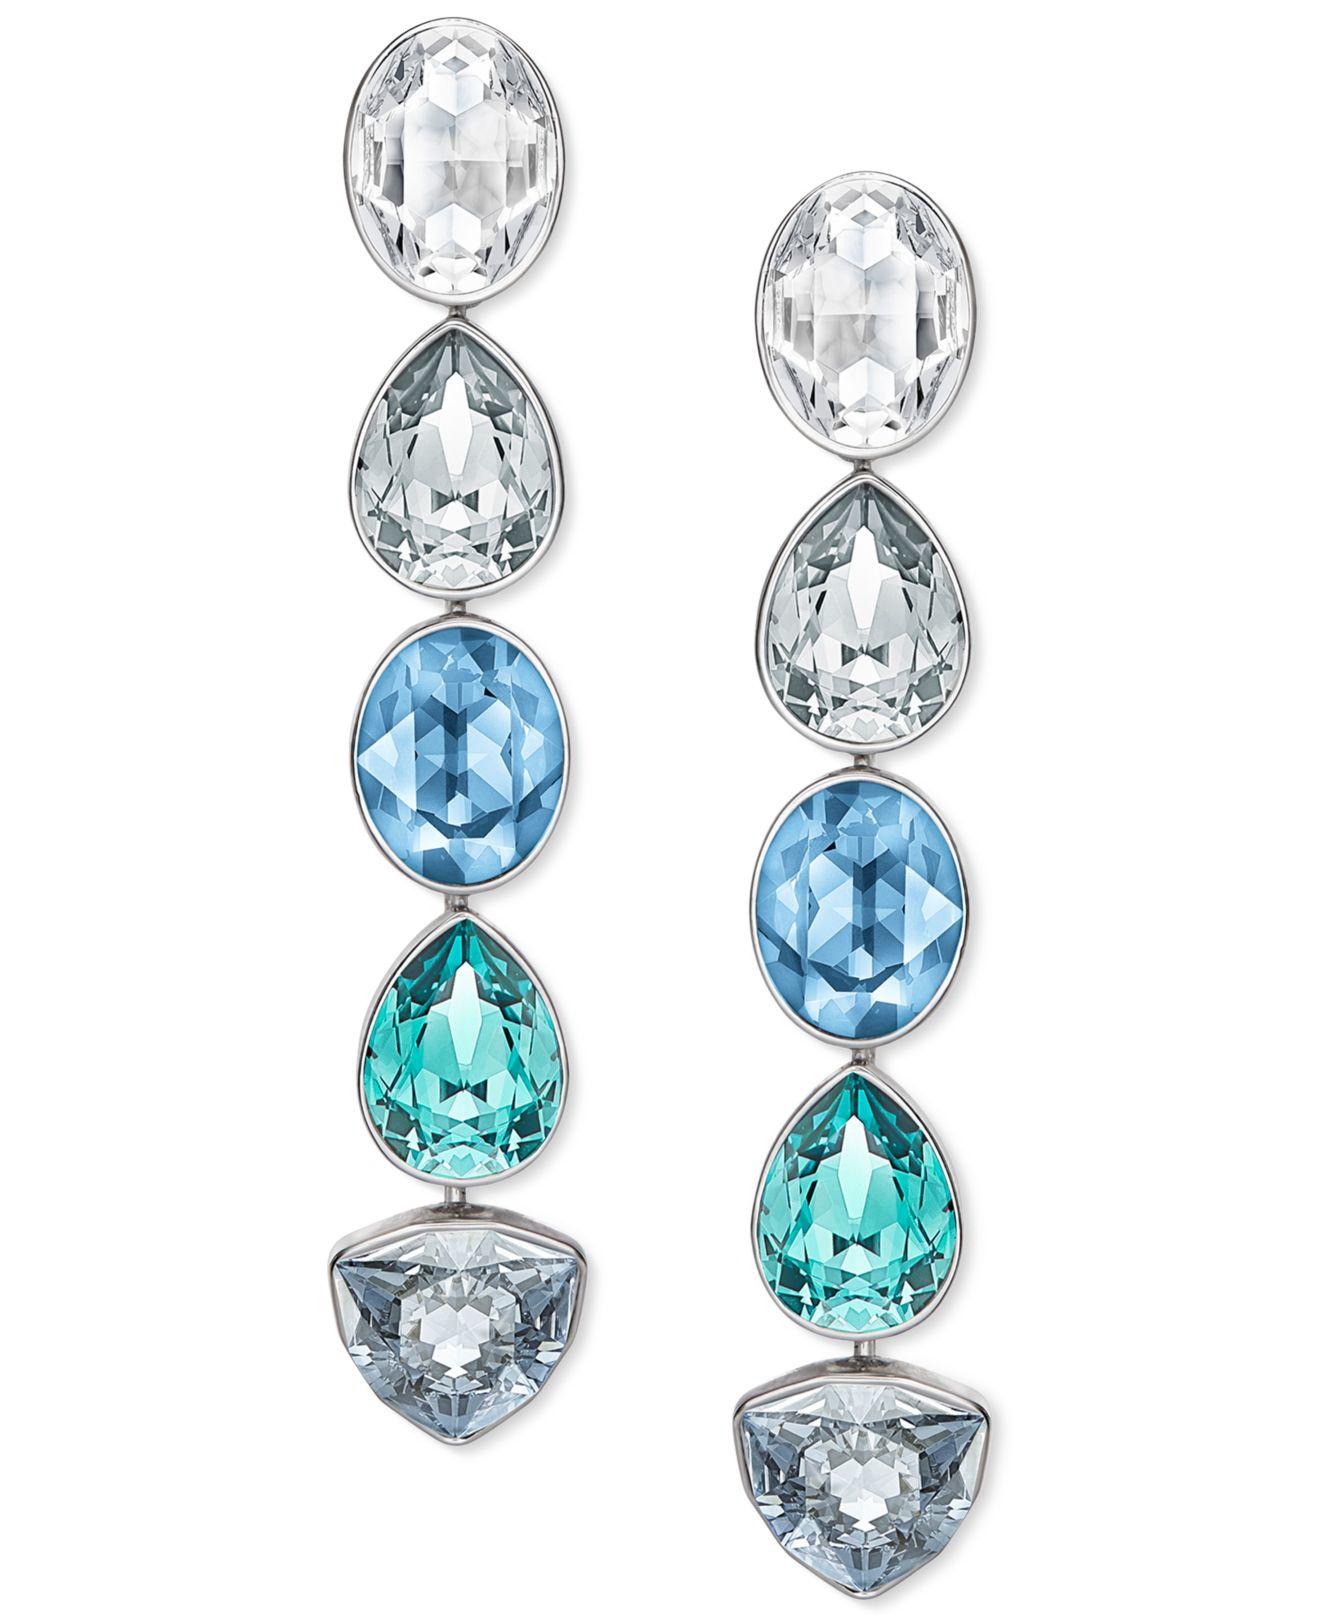 ca6effaf0 Blue Crystal Earrings Swarovski - Best All Earring Photos ...